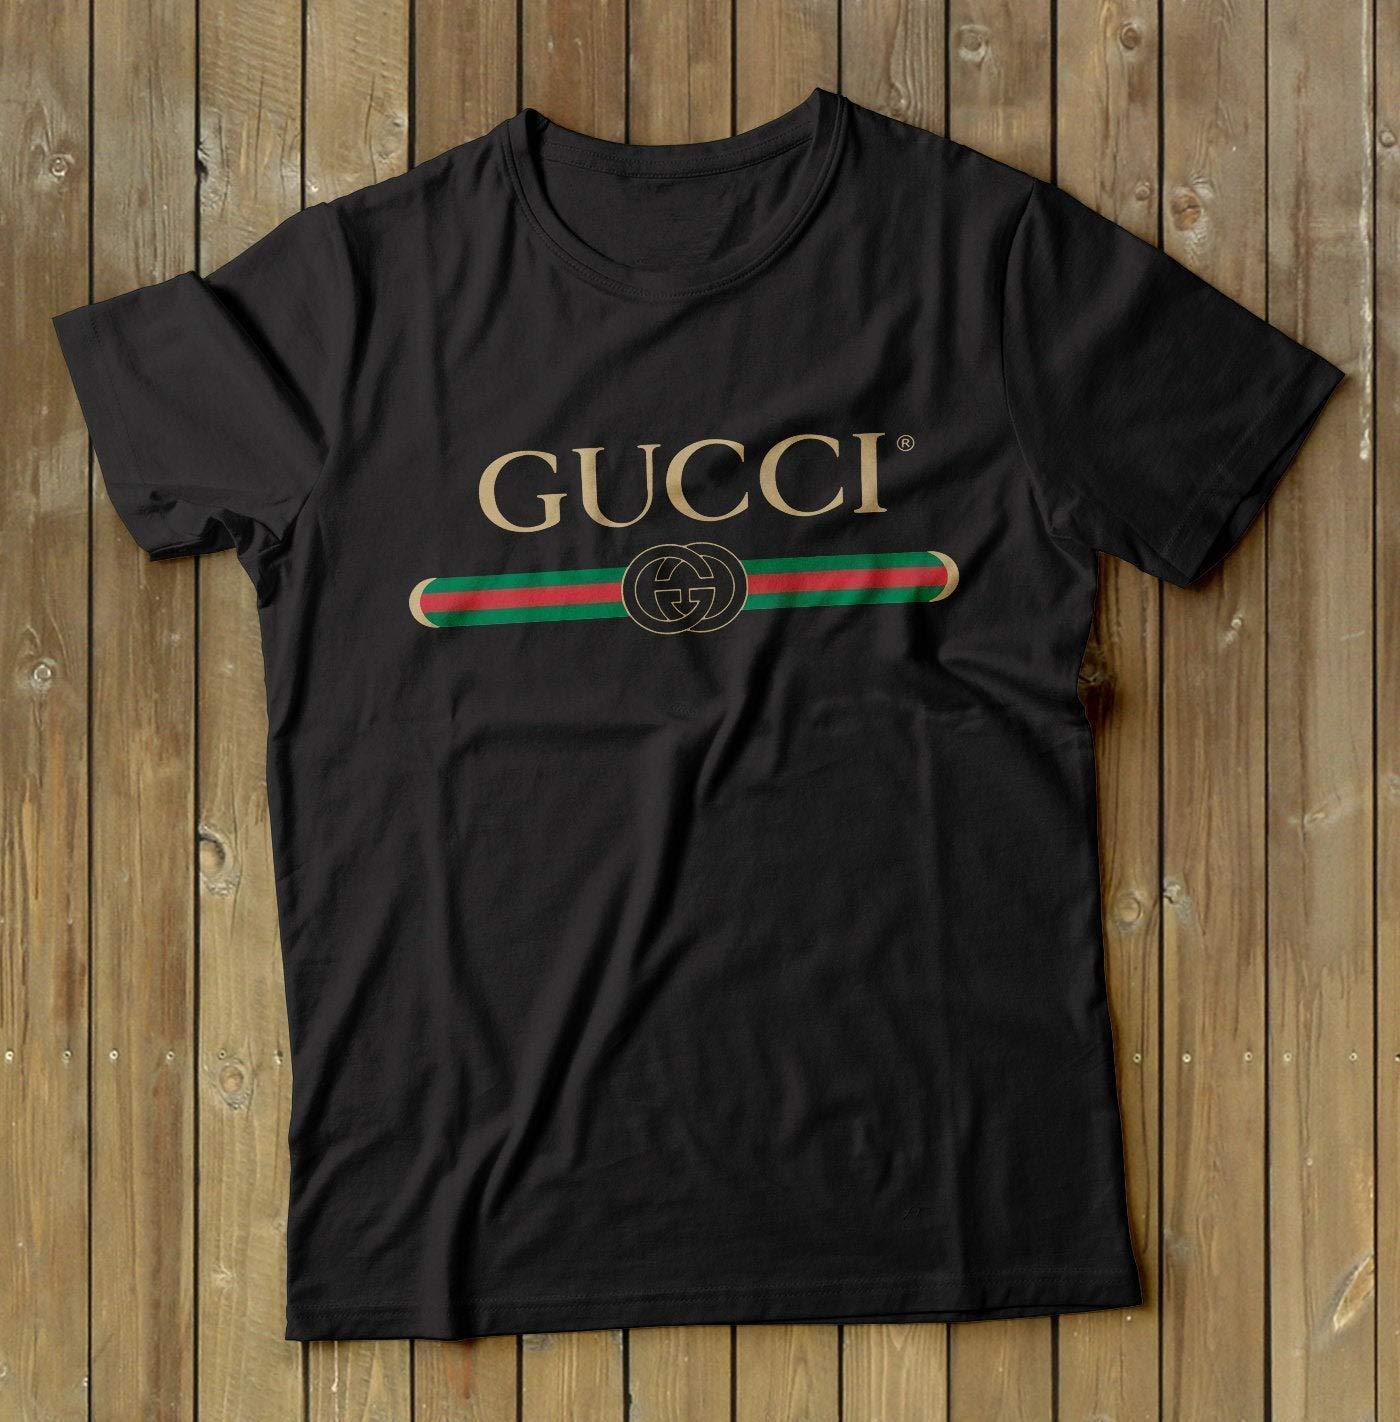 Amazon.com: Gucci Tshirt, Gucci Shirt, Gucci Shirt T.